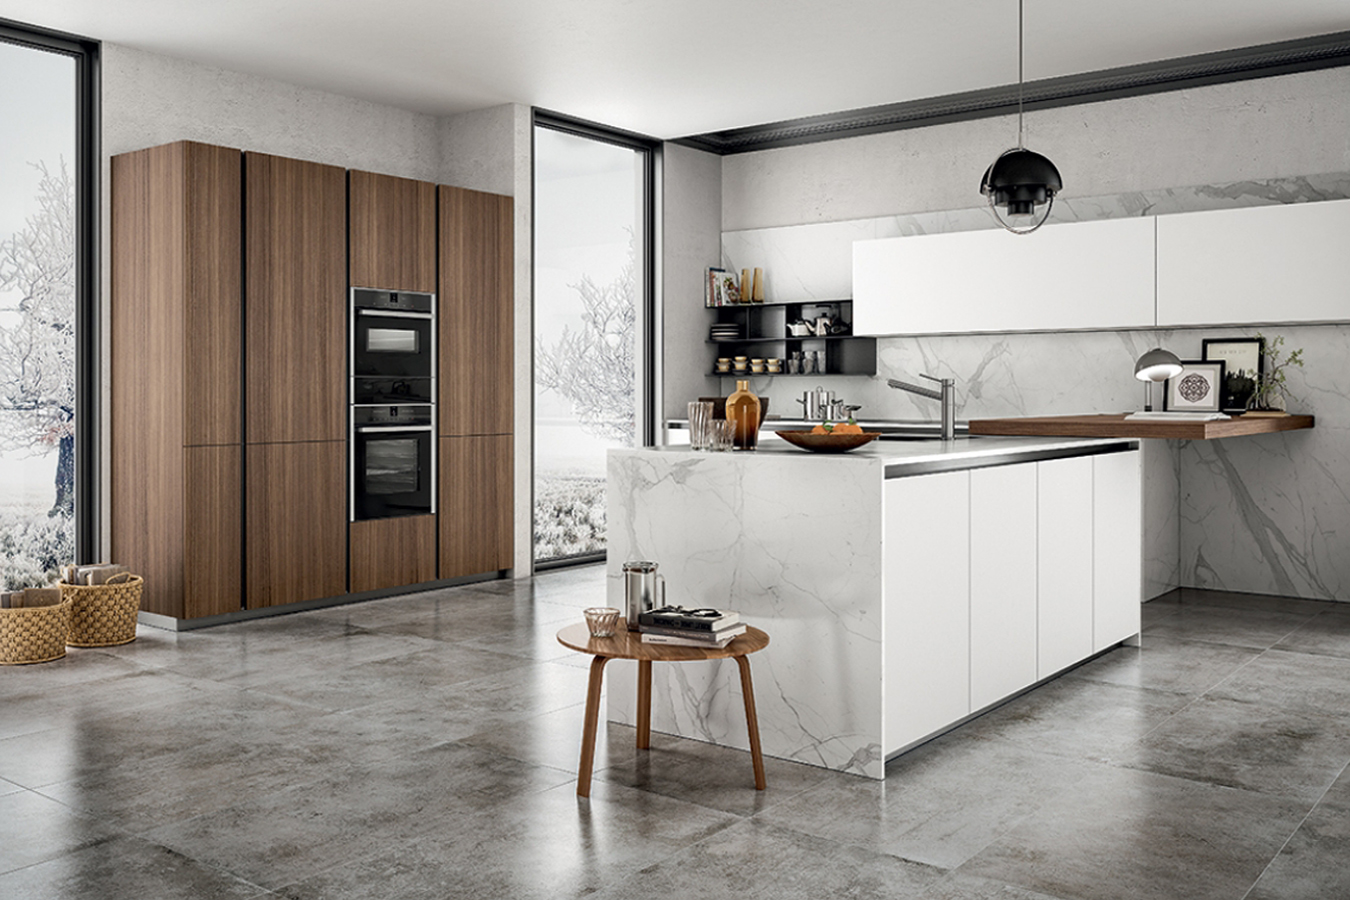 cucina zetasei di arredo3 righetti mobili novara